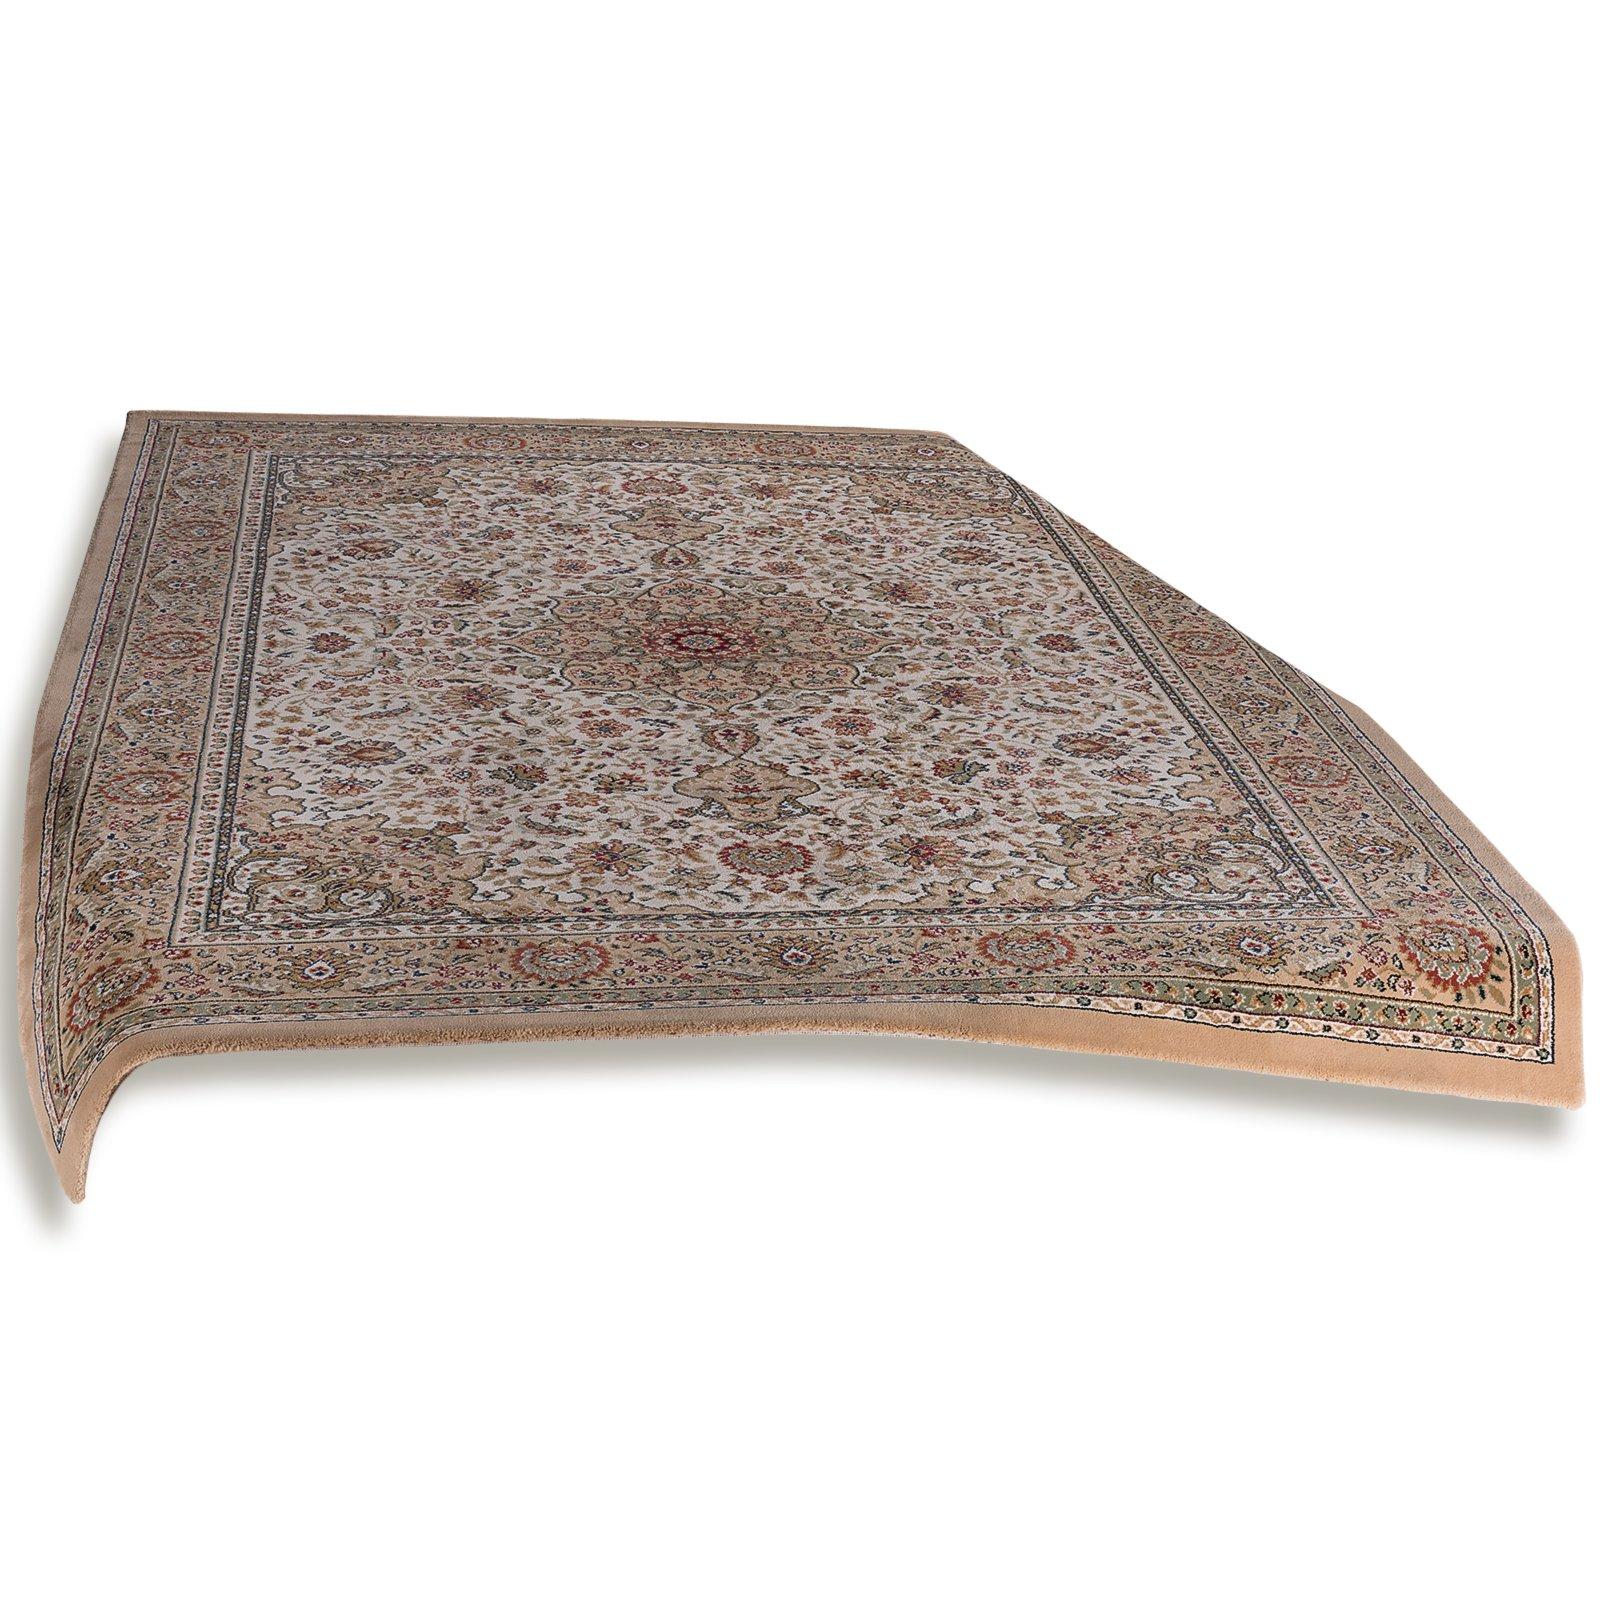 teppich taiga creme 240x340 cm orient teppiche teppiche l ufer deko haushalt. Black Bedroom Furniture Sets. Home Design Ideas